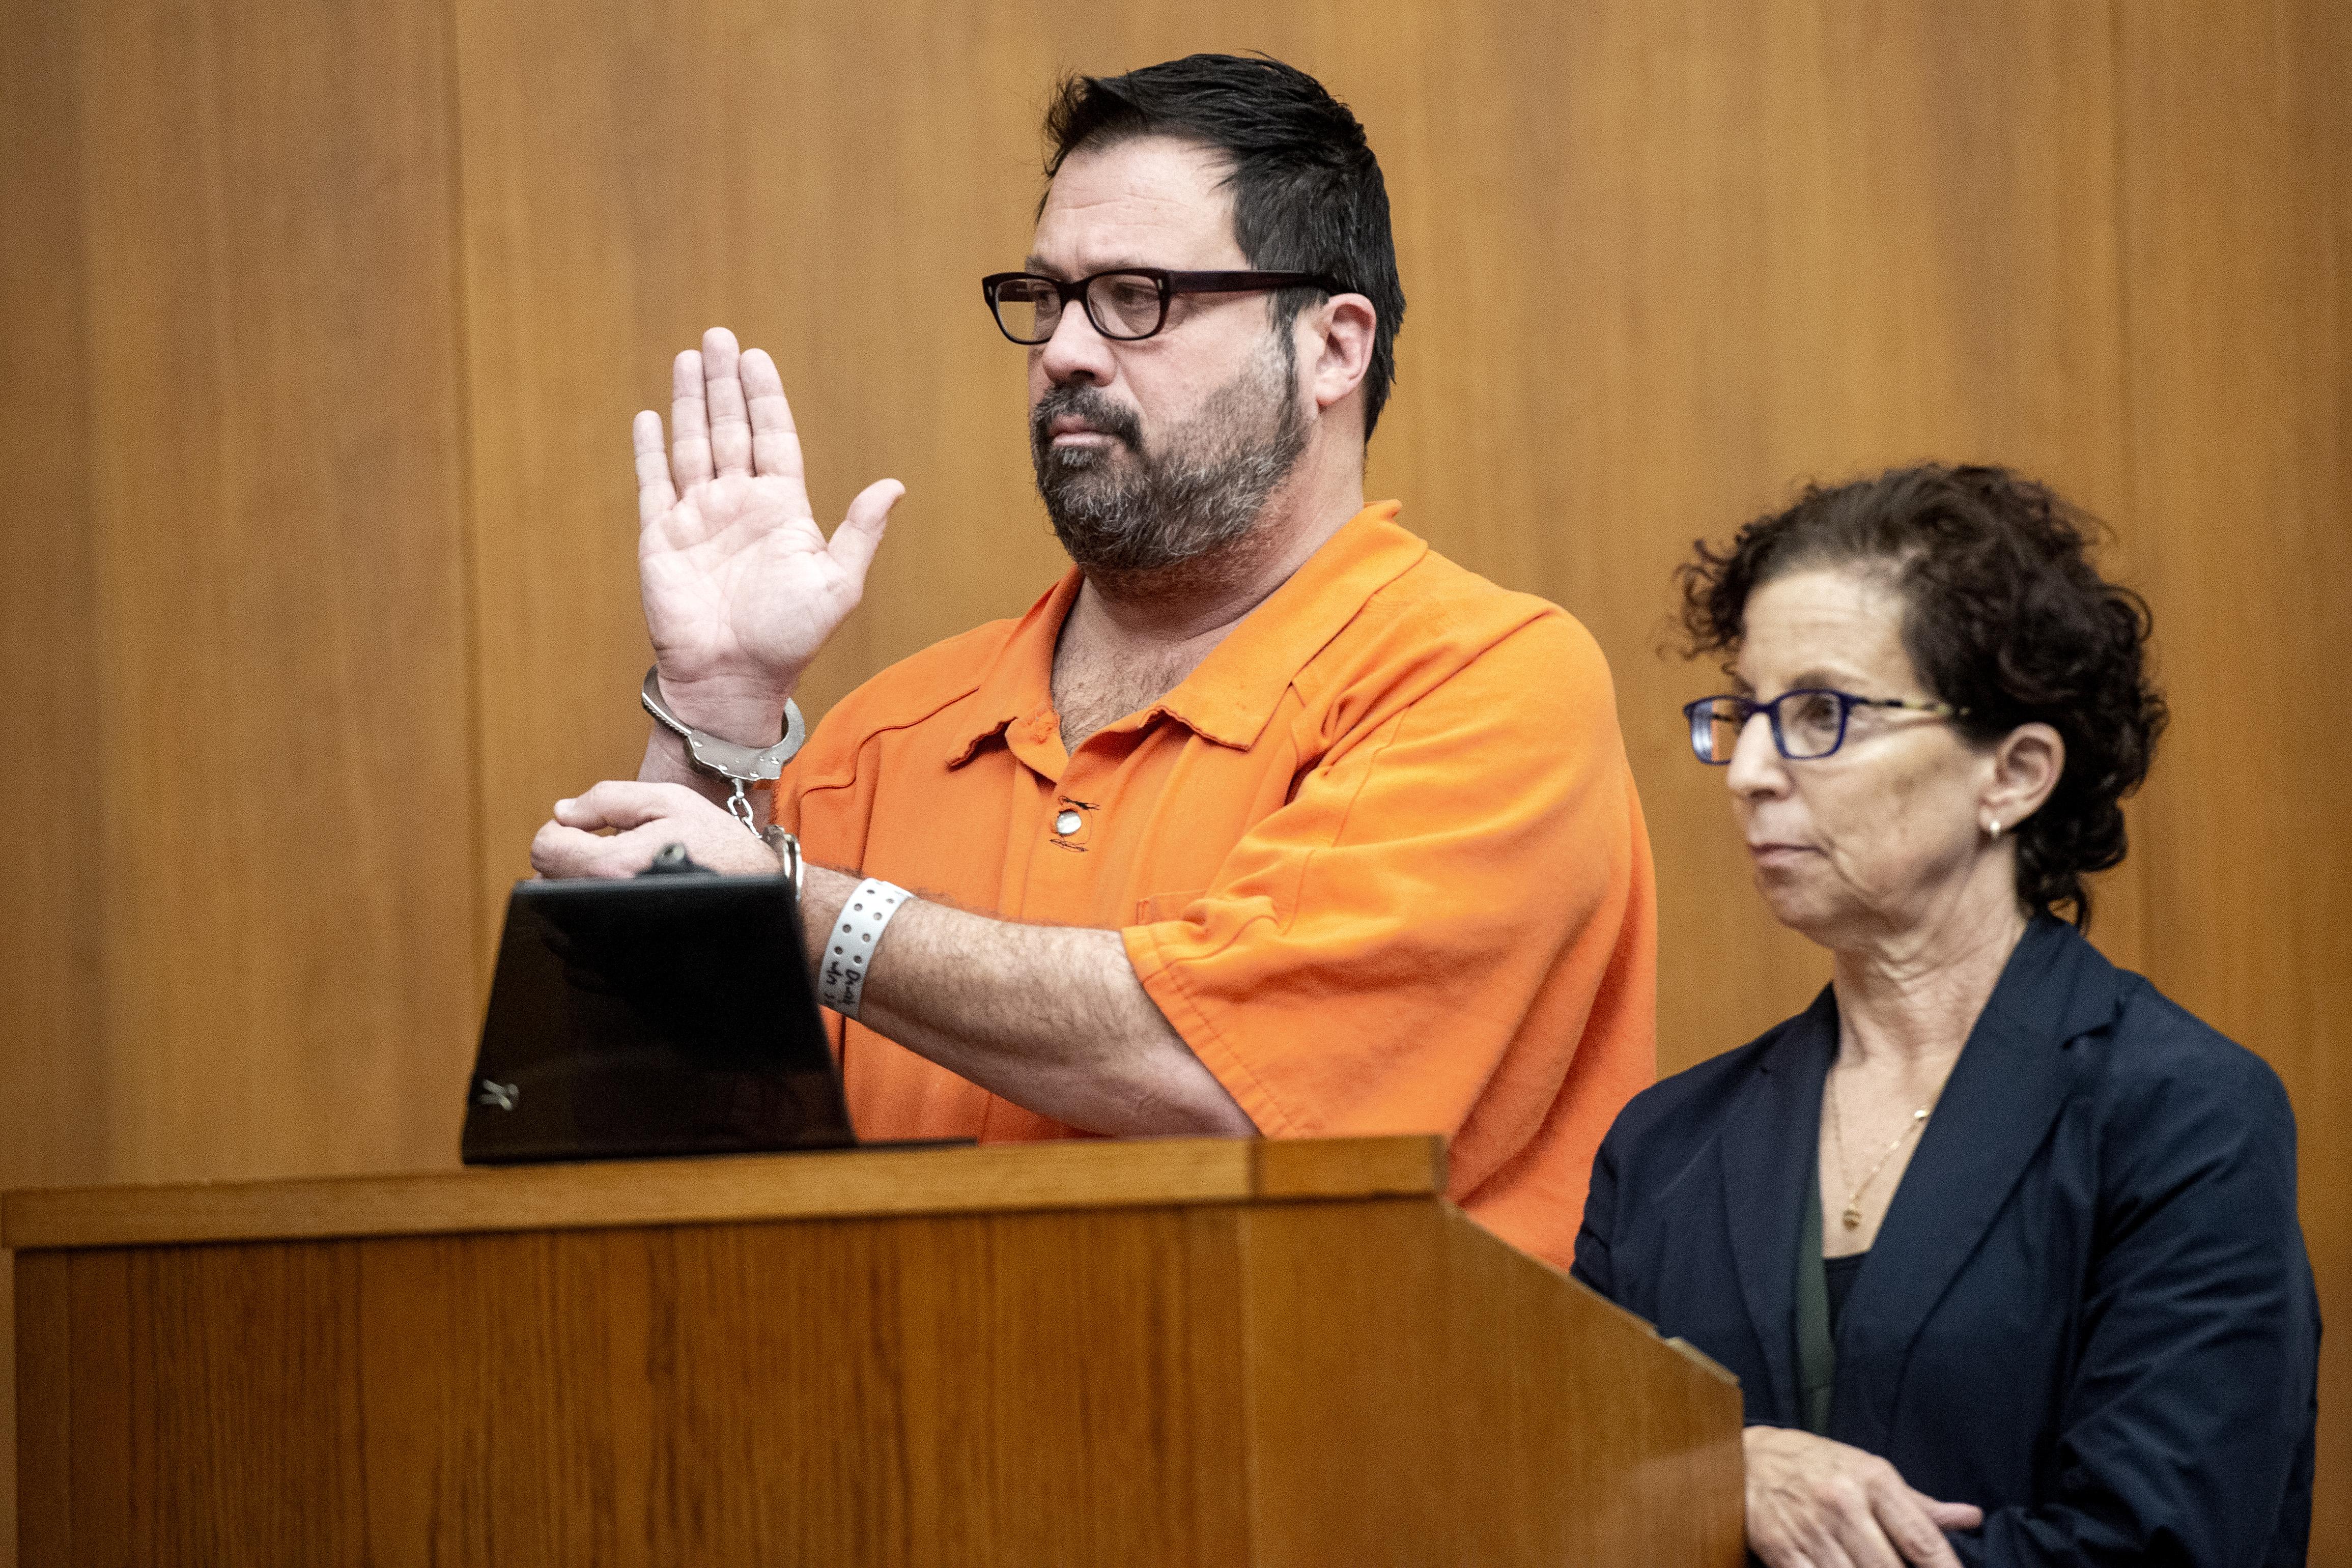 UM to consider firing UM opera professor charged in rape case